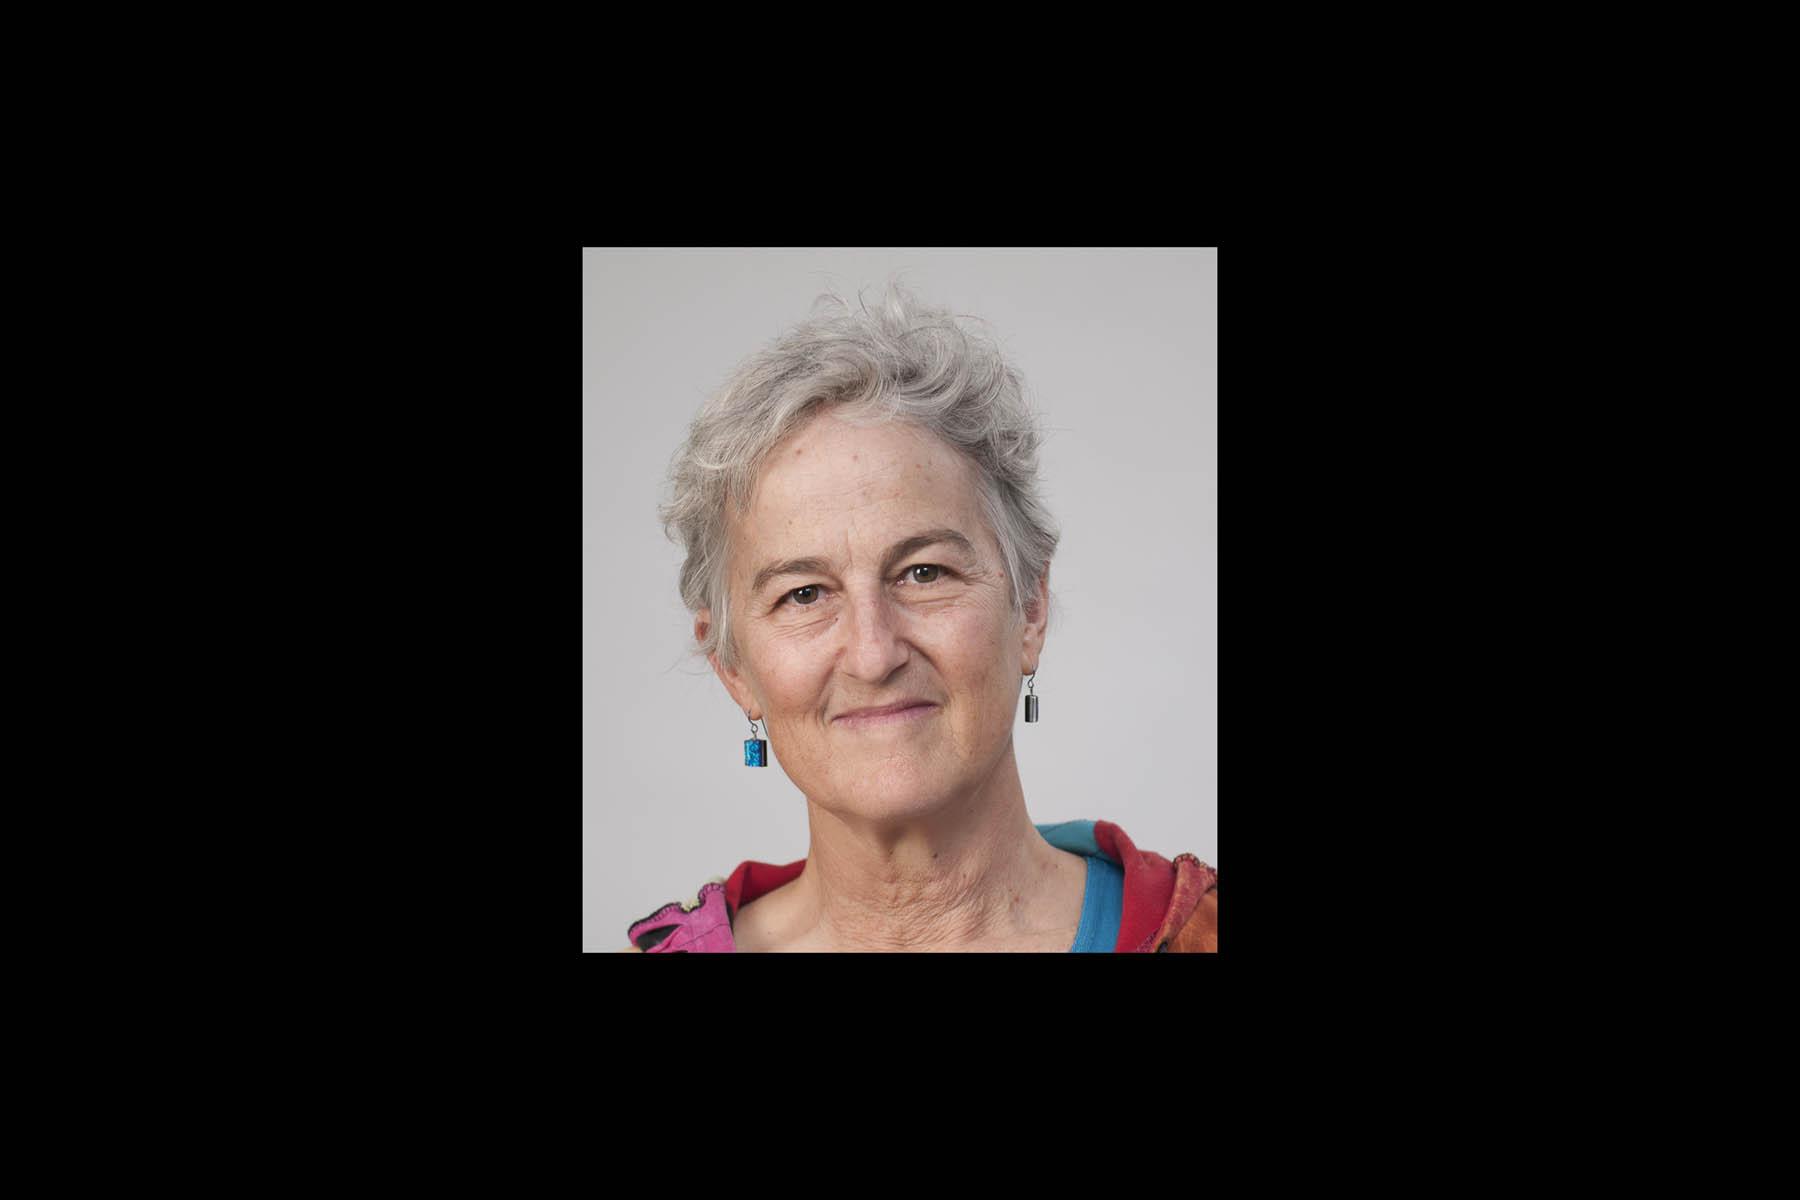 Nancy Folbre Economix Blog The New York Times Autos Post